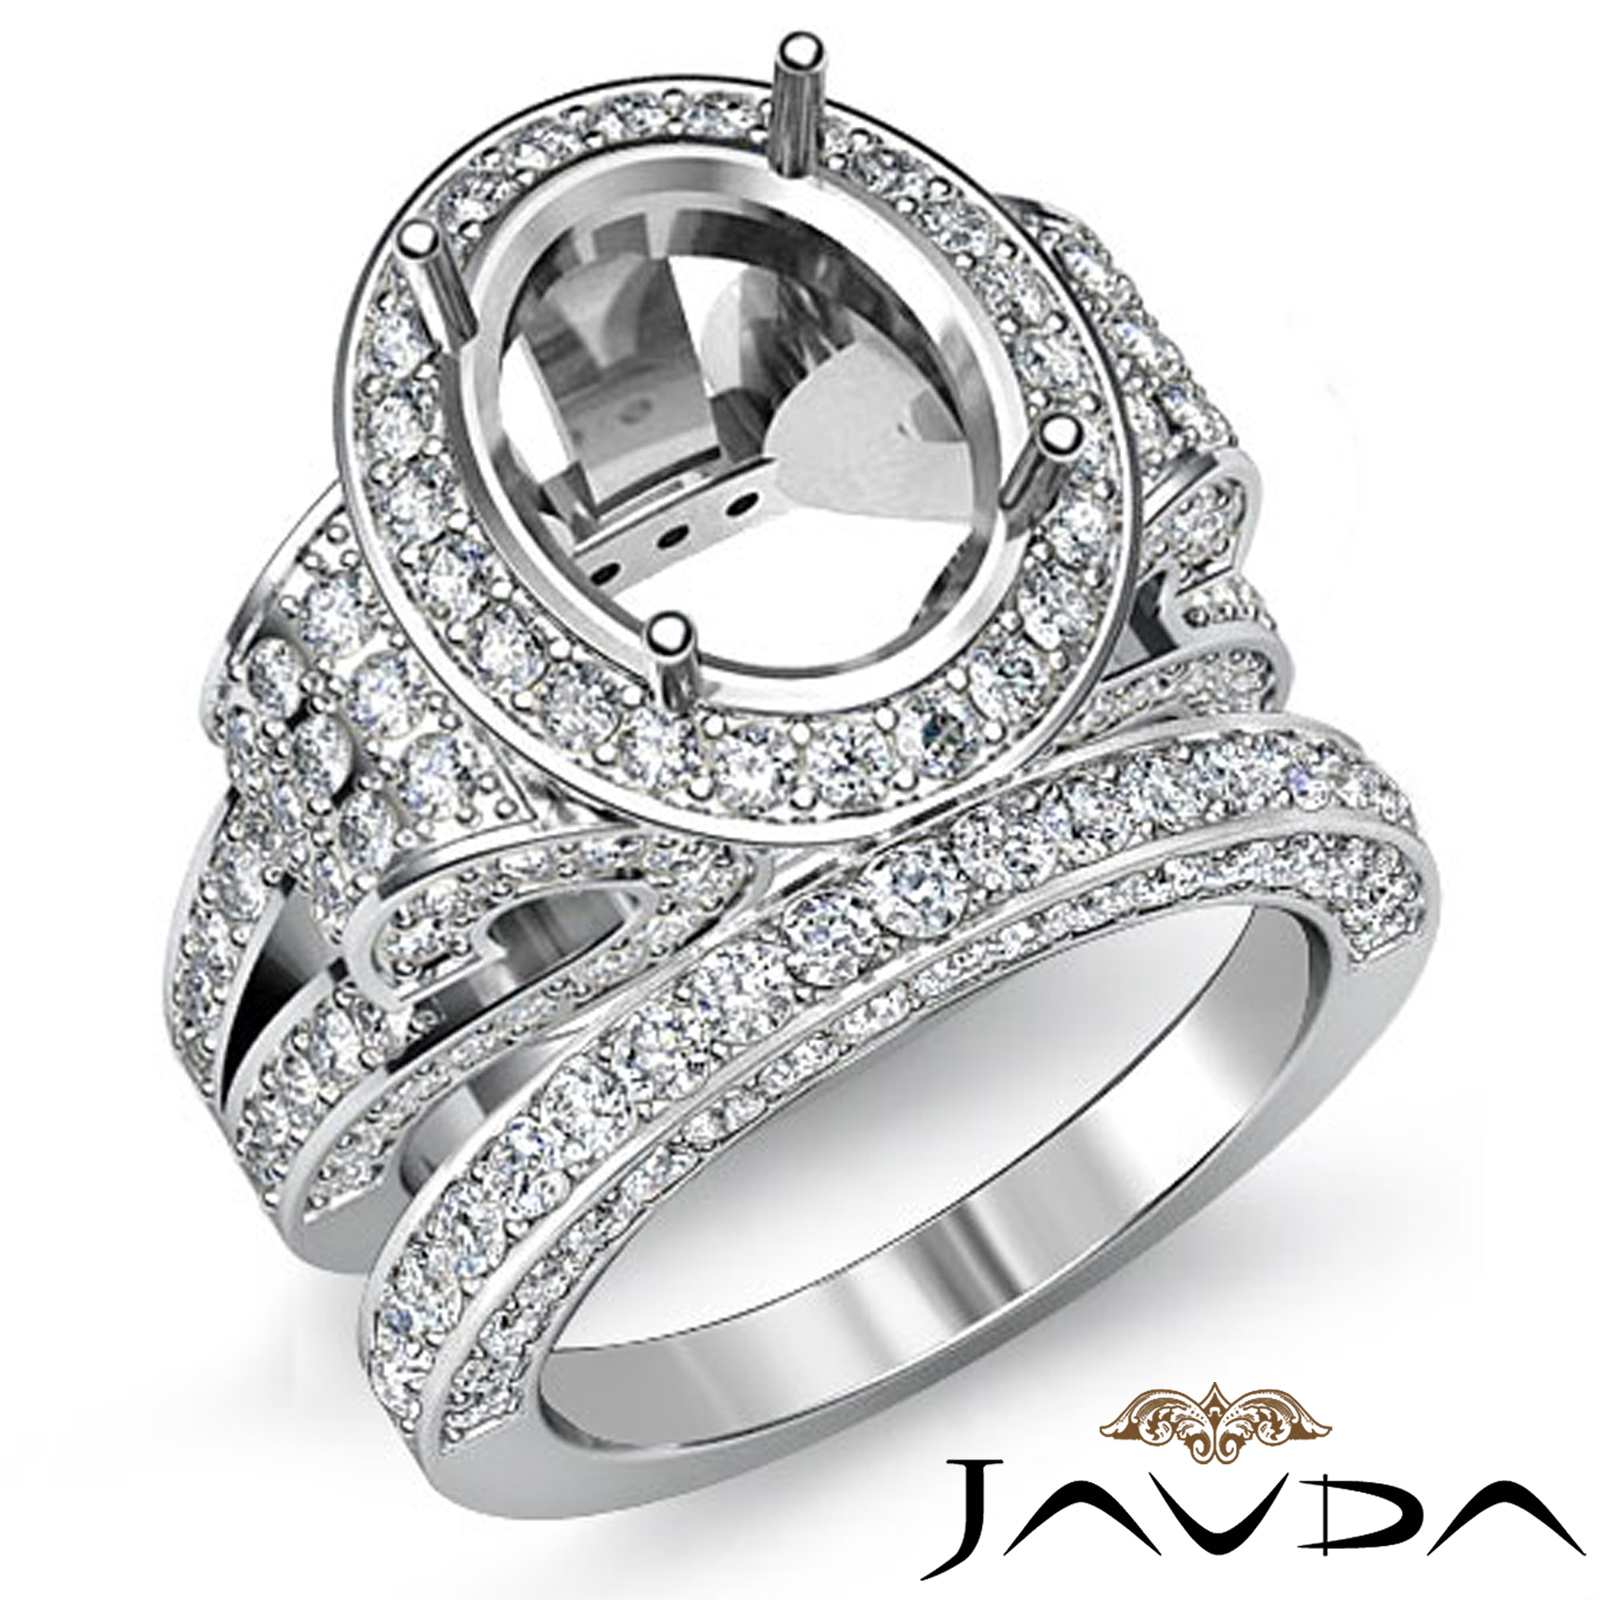 Diamond Engagement Semi Mount Ring Oval Pave Bridal Sets